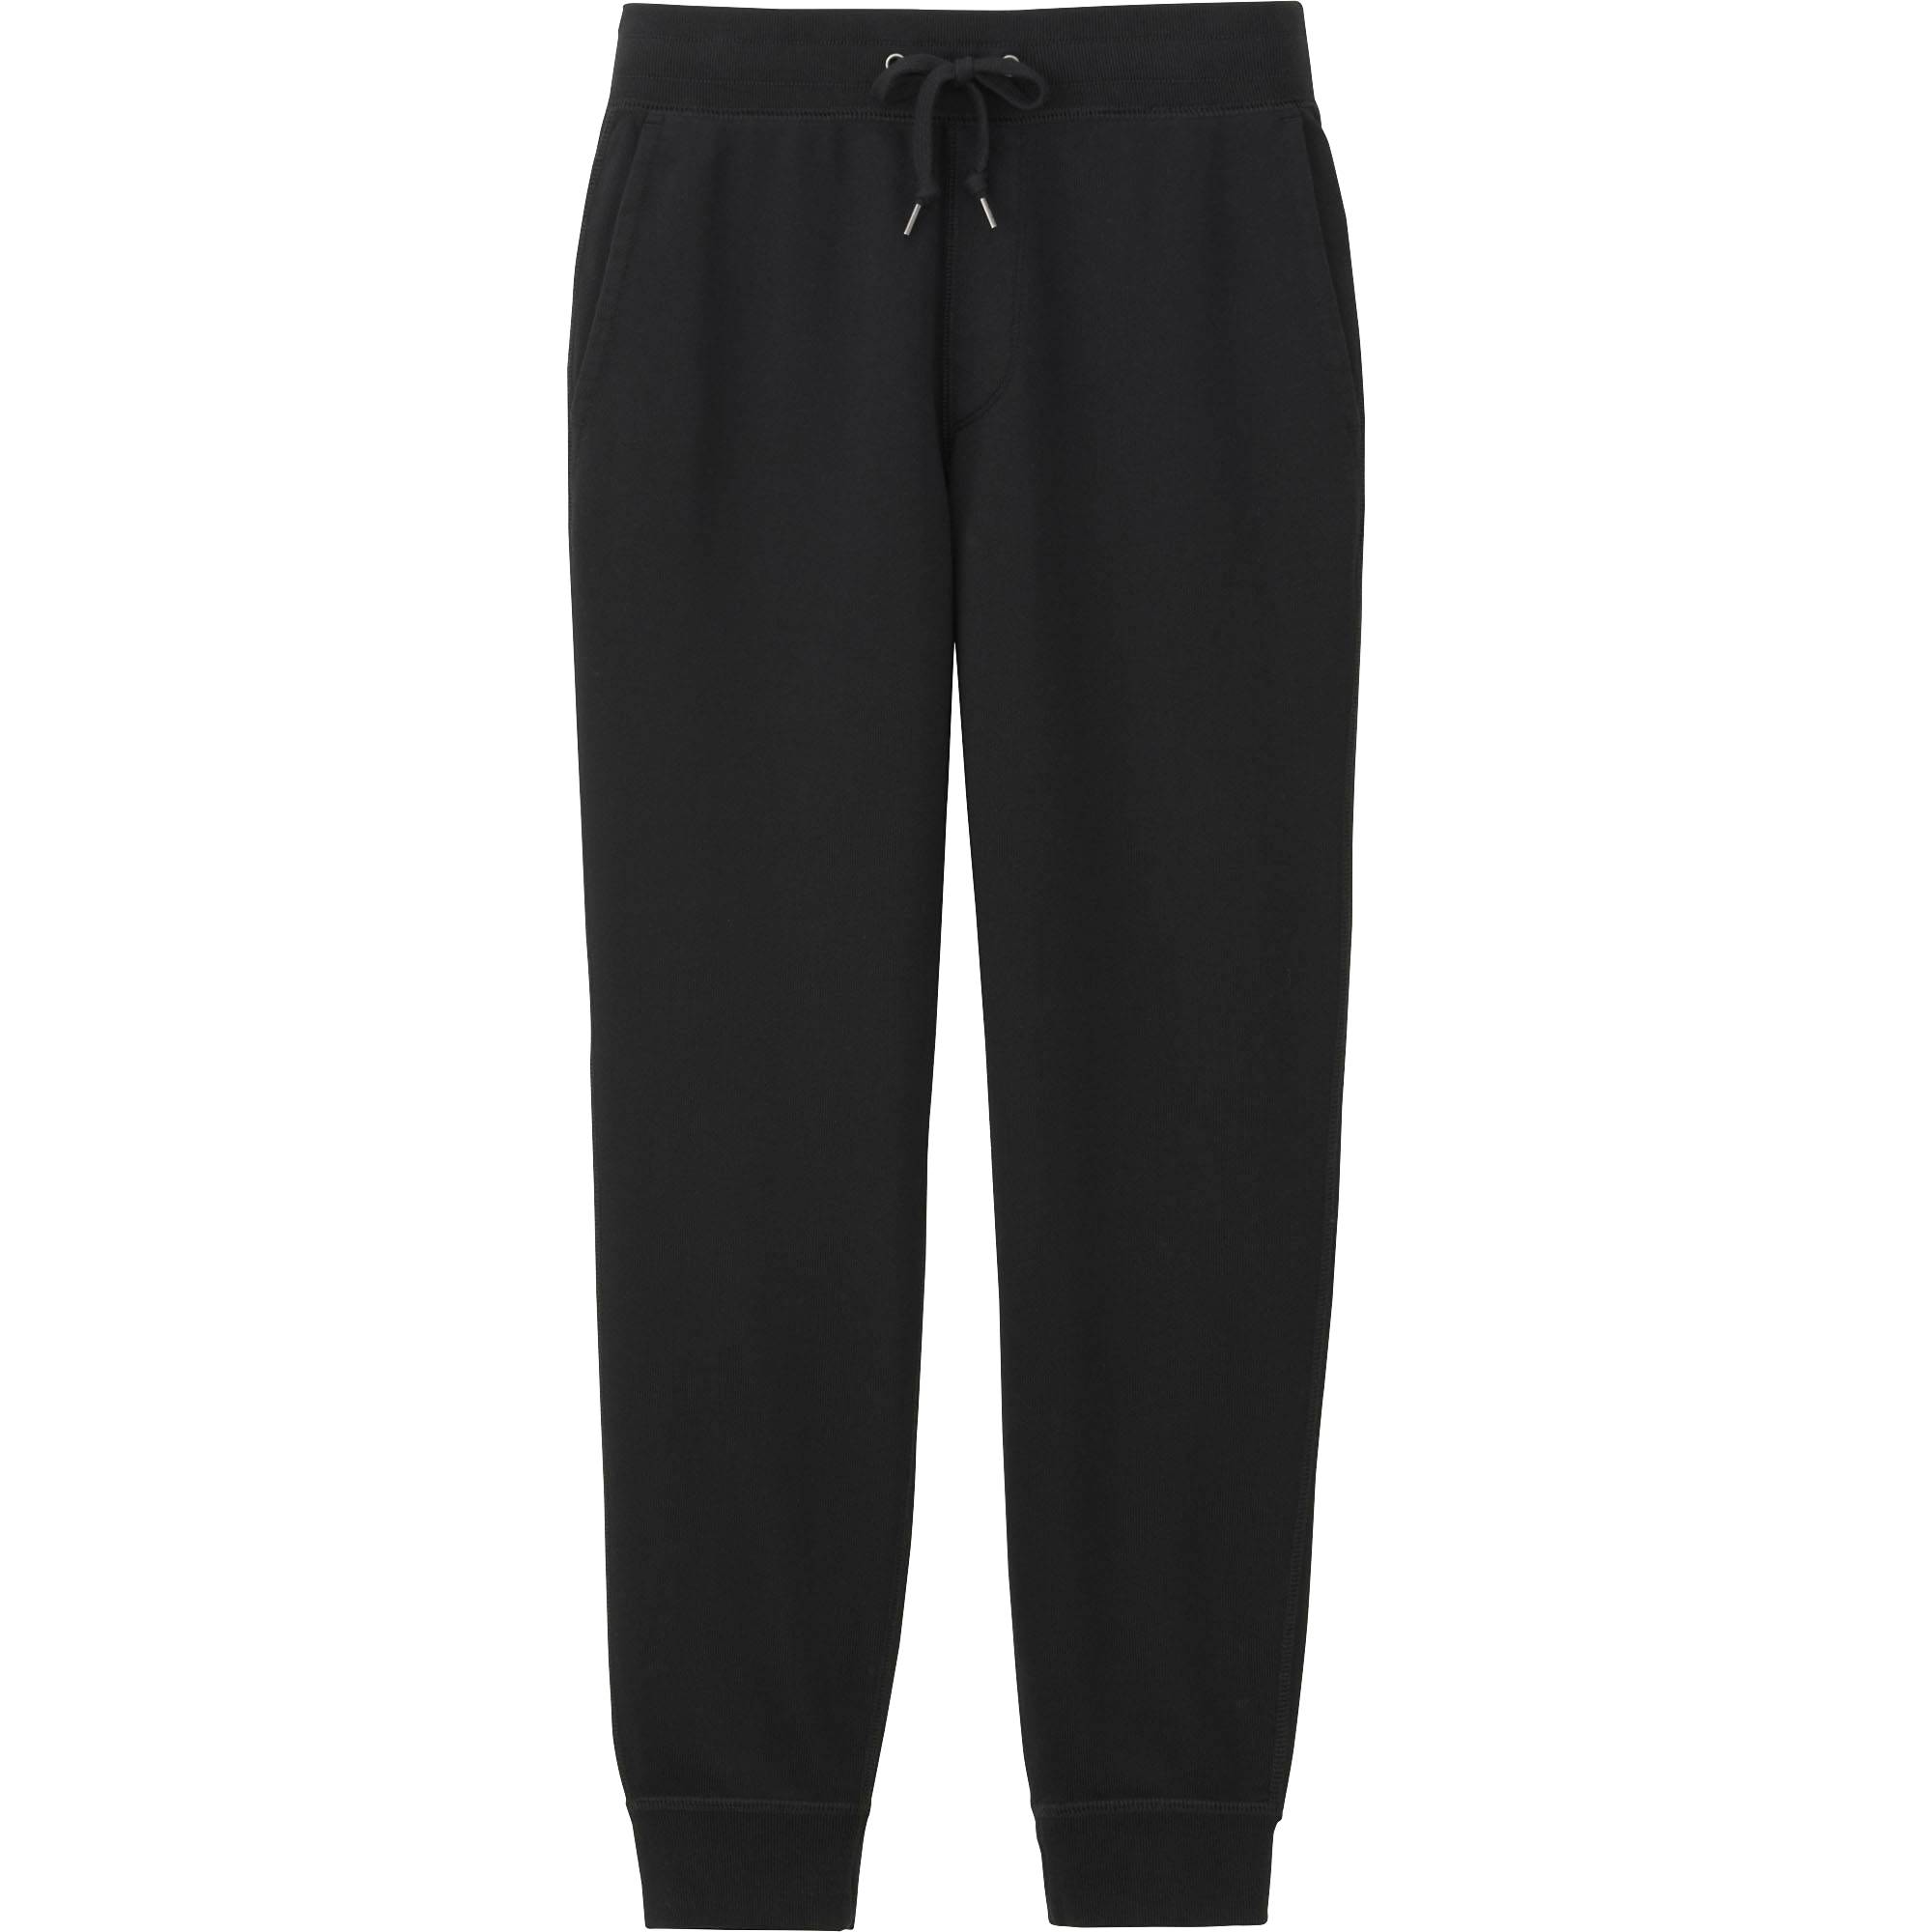 sweatpants for men men sweatpants, black, small jydfslv